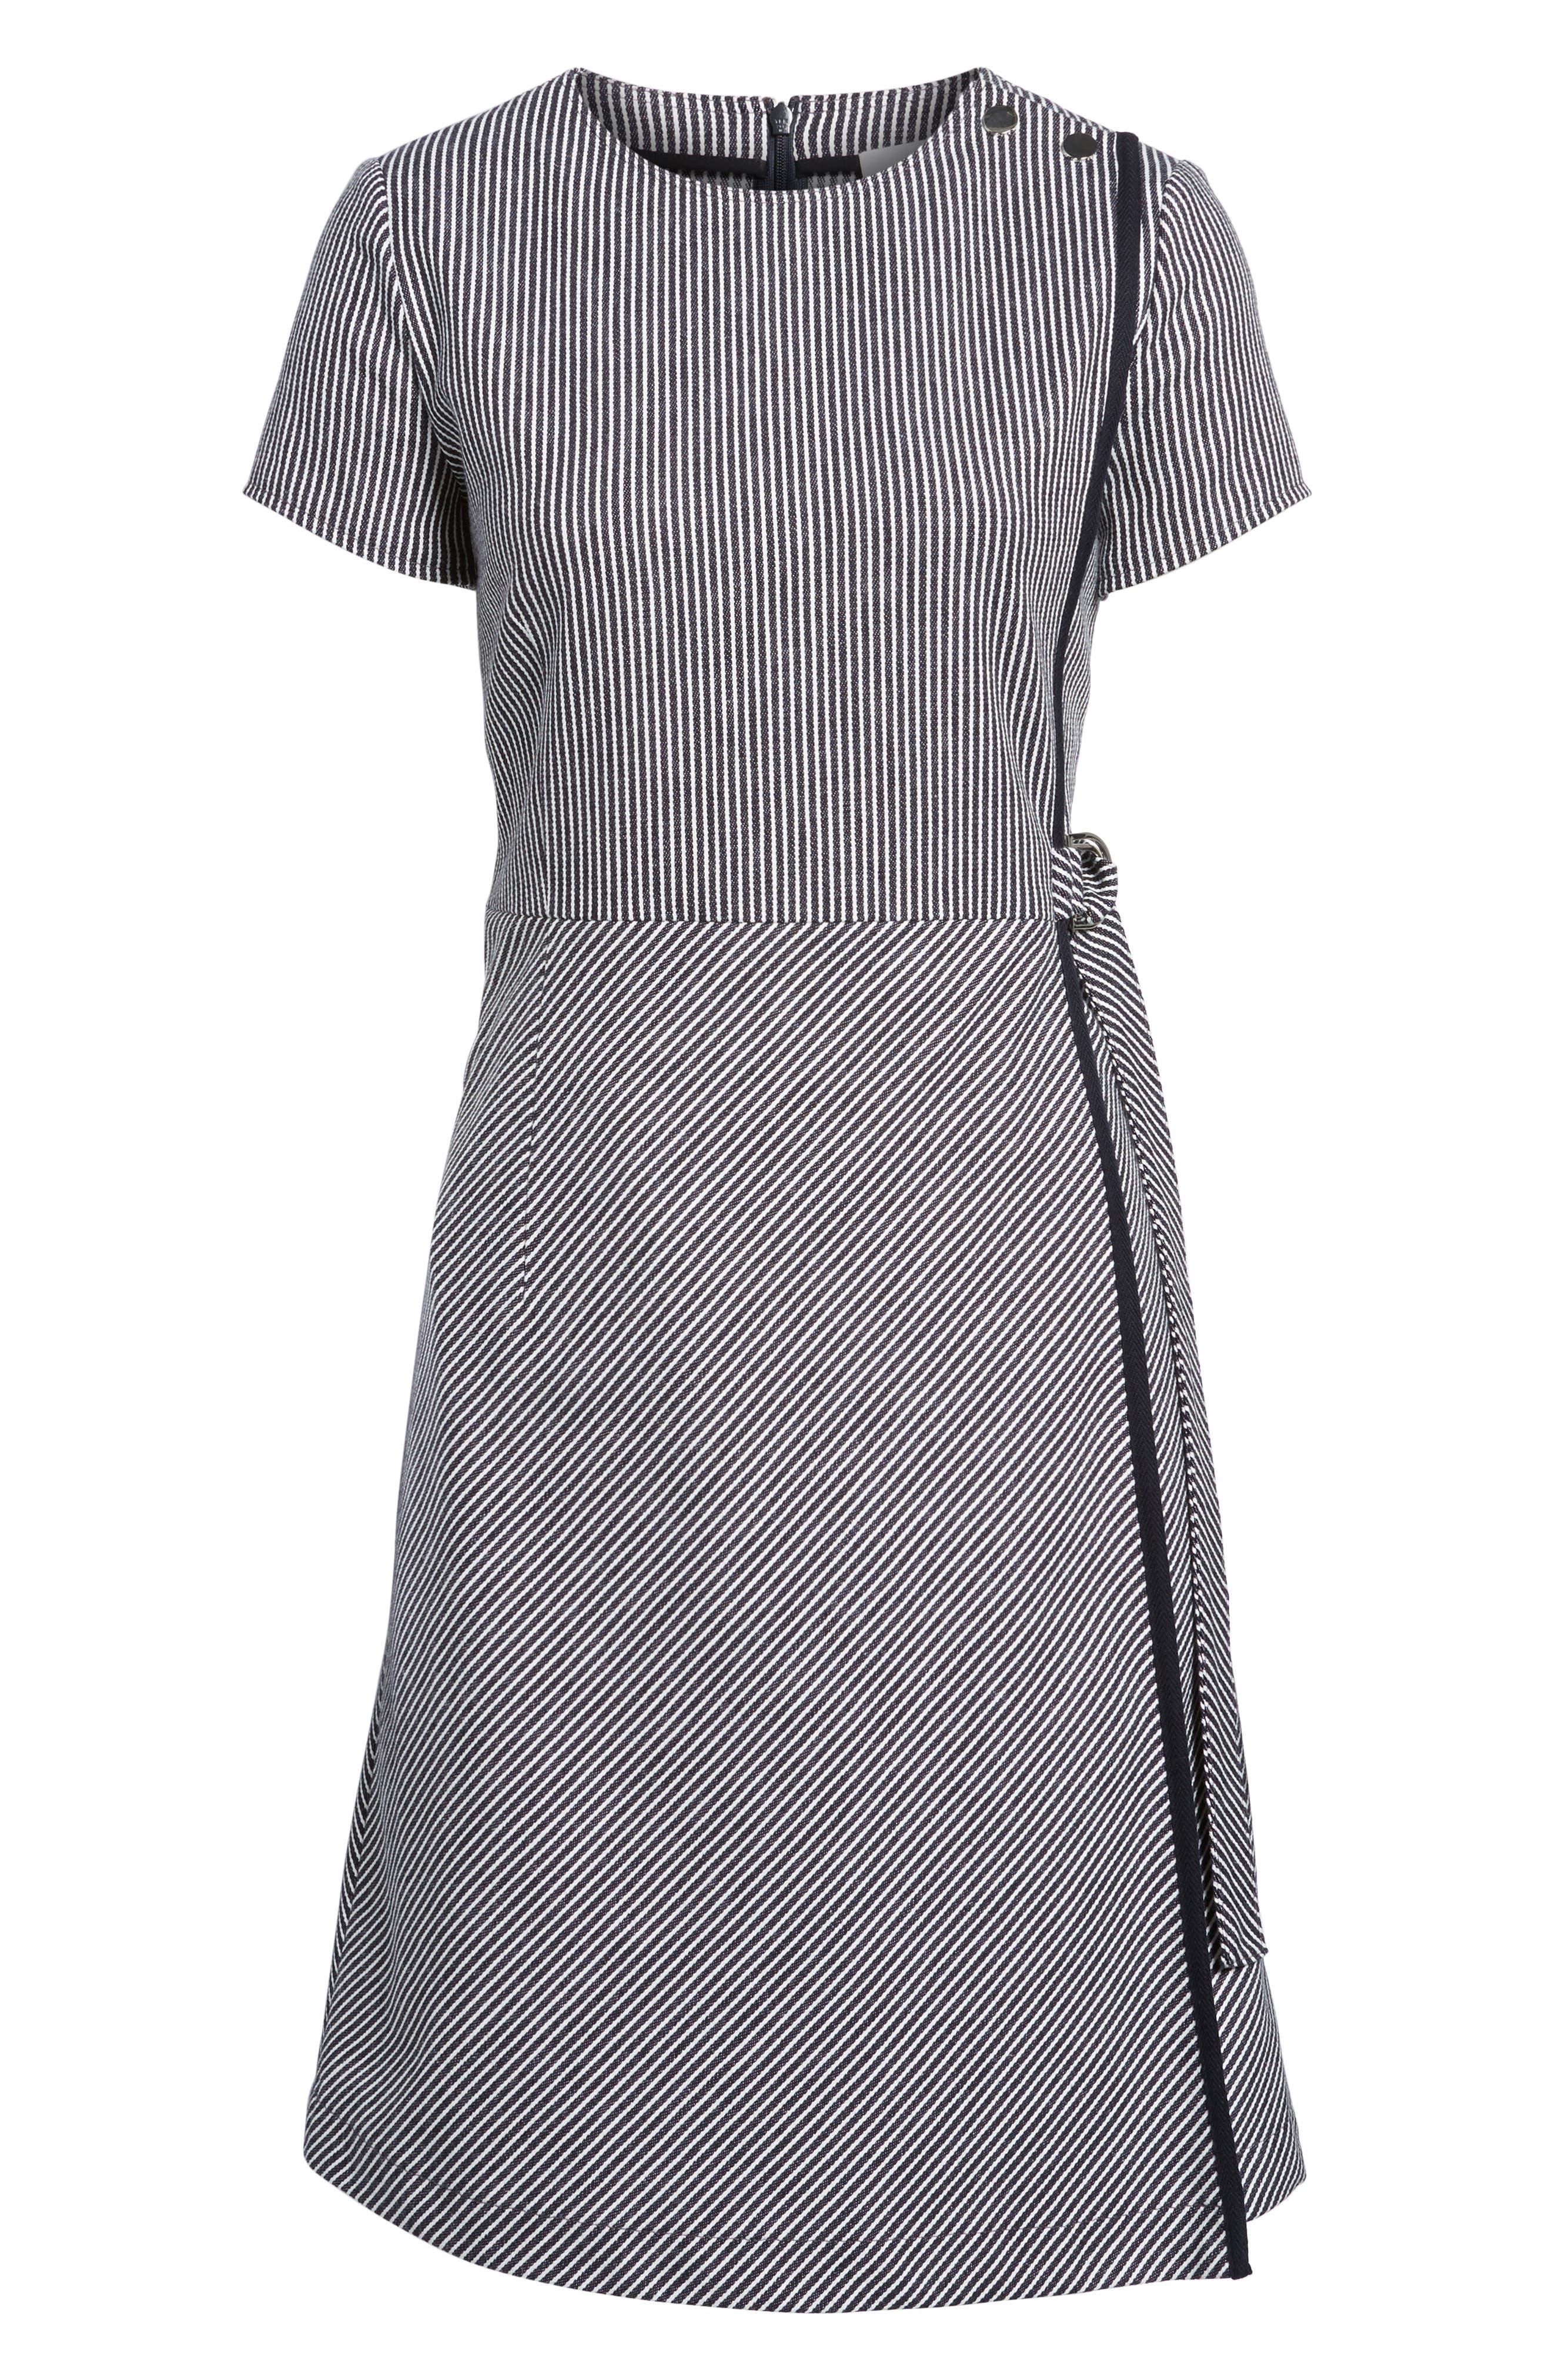 Hugo Boss Hadiana Dress,                             Alternate thumbnail 6, color,                             461